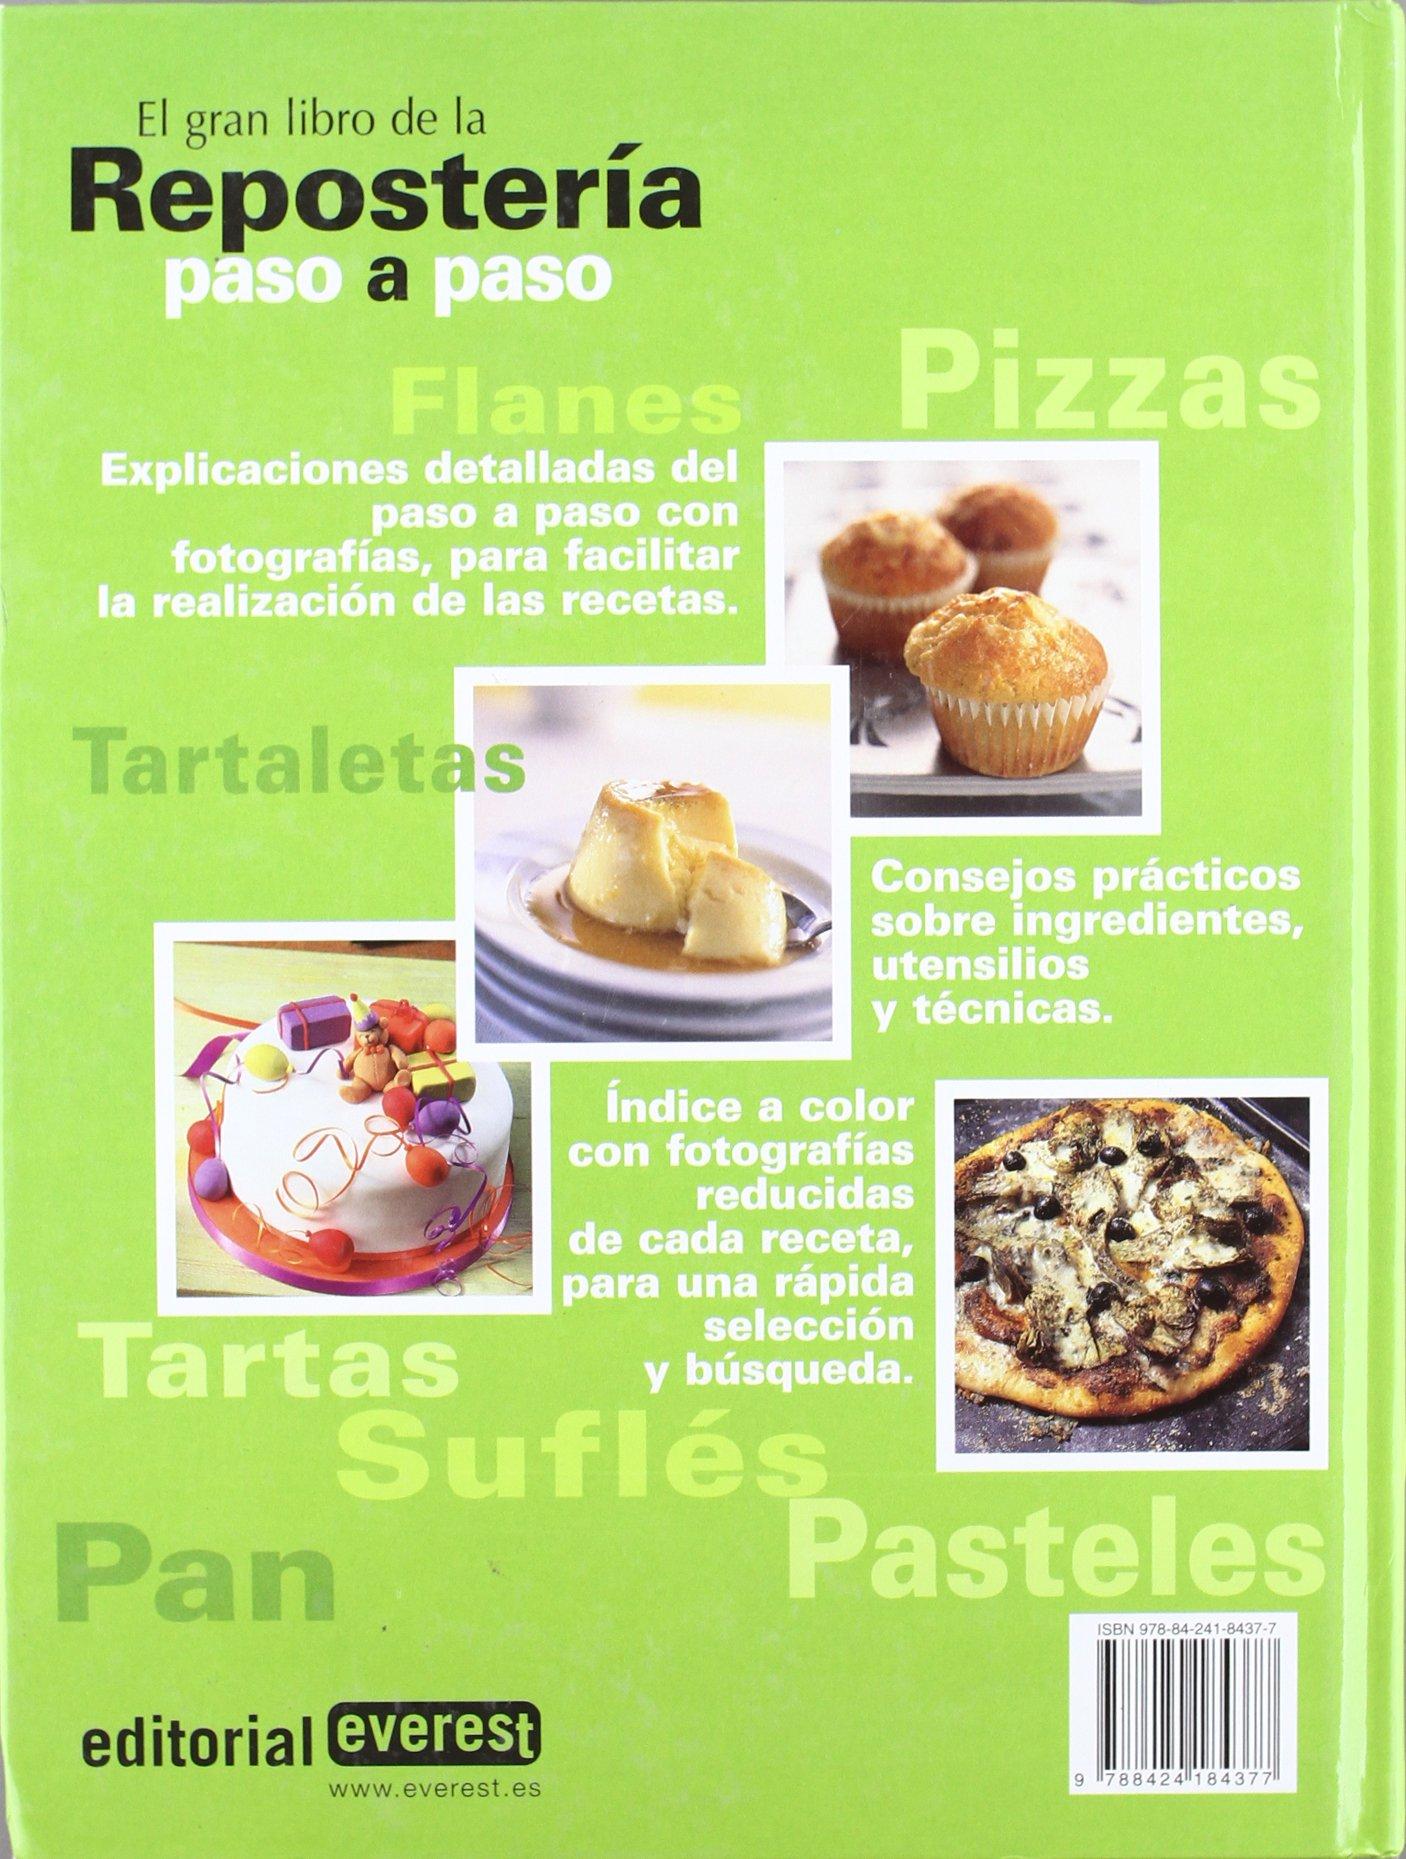 El Gran Libro De Reposteria Paso A Paso/ The Great Book of Baking Step by Step (Spanish Edition): Janet Illsley: 9788424184377: Amazon.com: Books